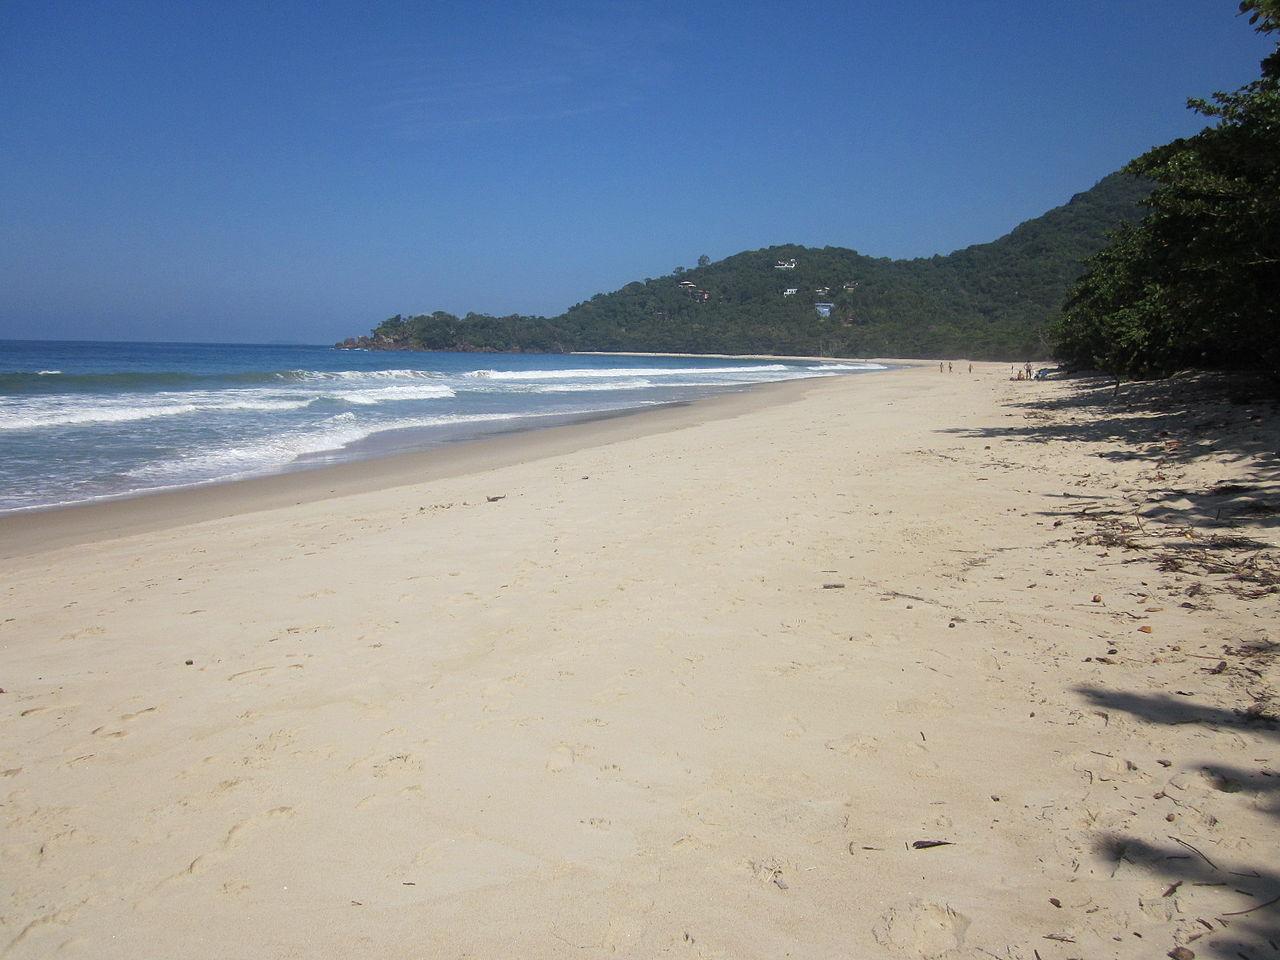 Praia de Itamambuca, em Ubatuba, onde há diversos Airbnb disponíveis para alugar